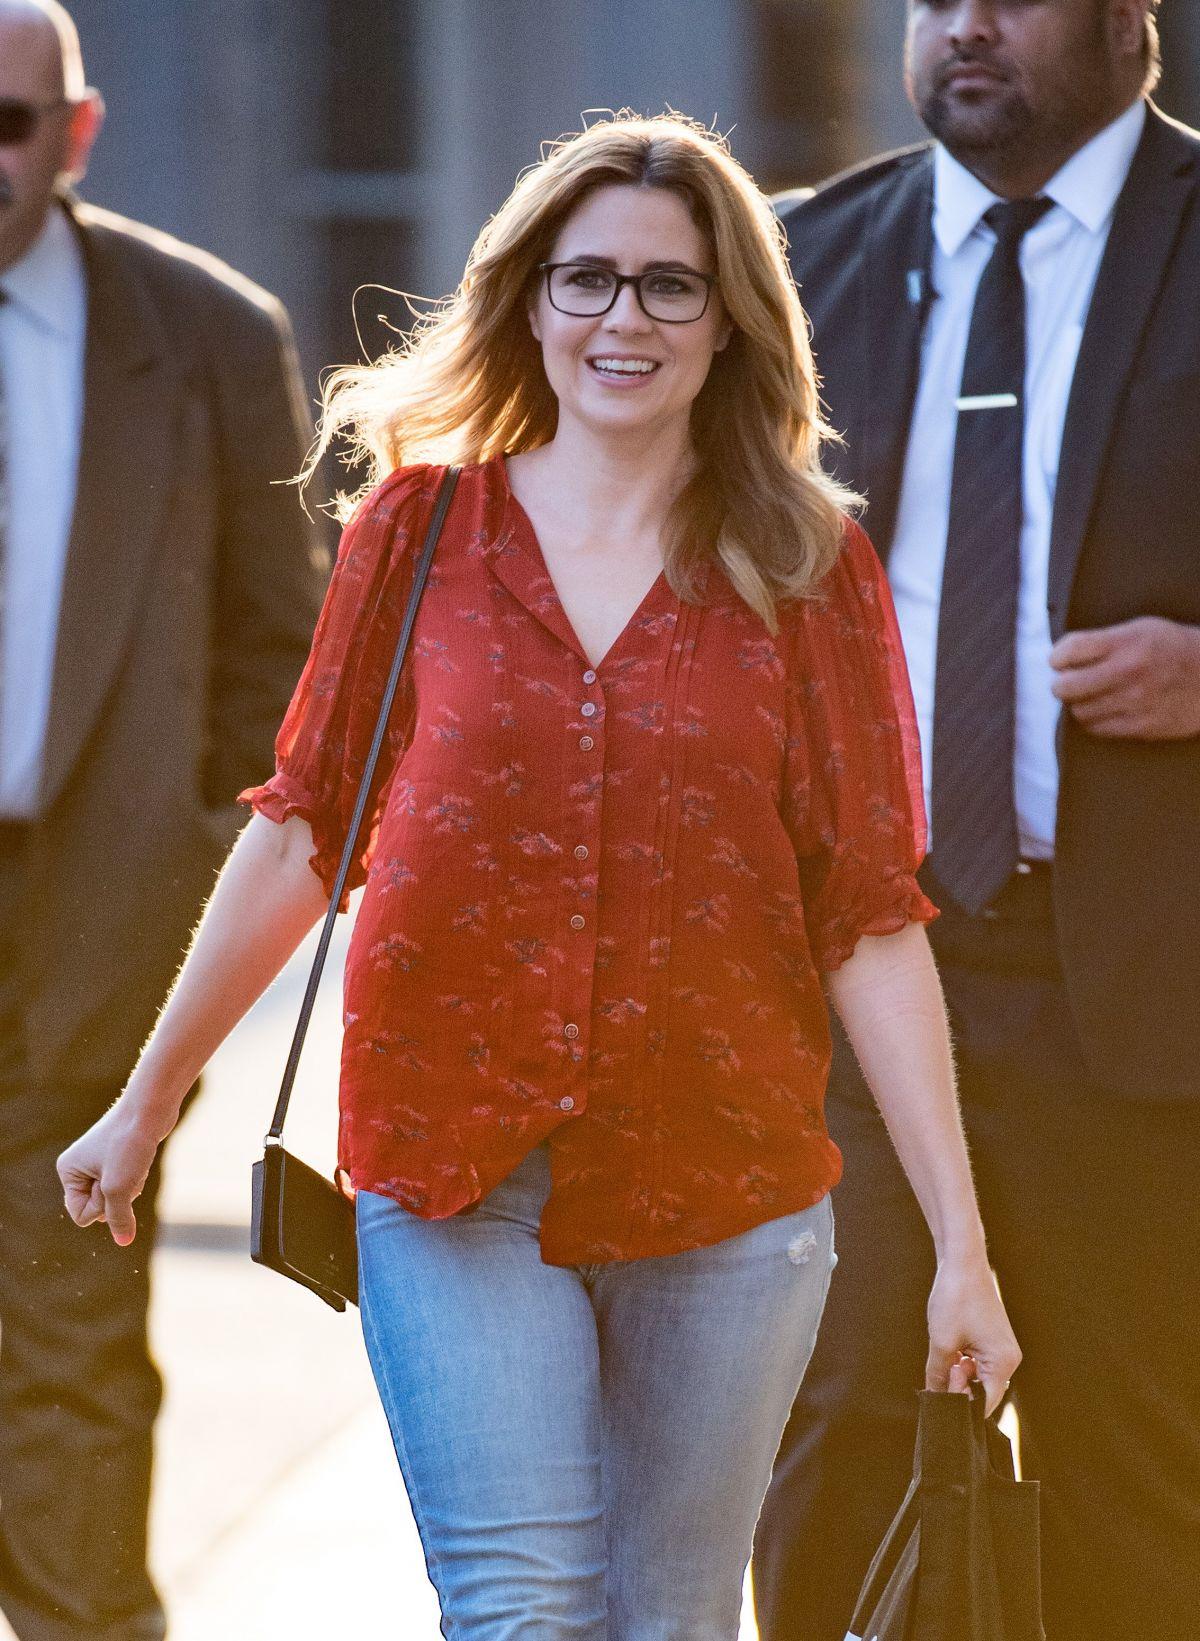 1450a4f993df7 JENNA FISCHER'S Wardrobe Malfunction at Jimmy Kimmel Live! in Los Angeles  04/02/2018